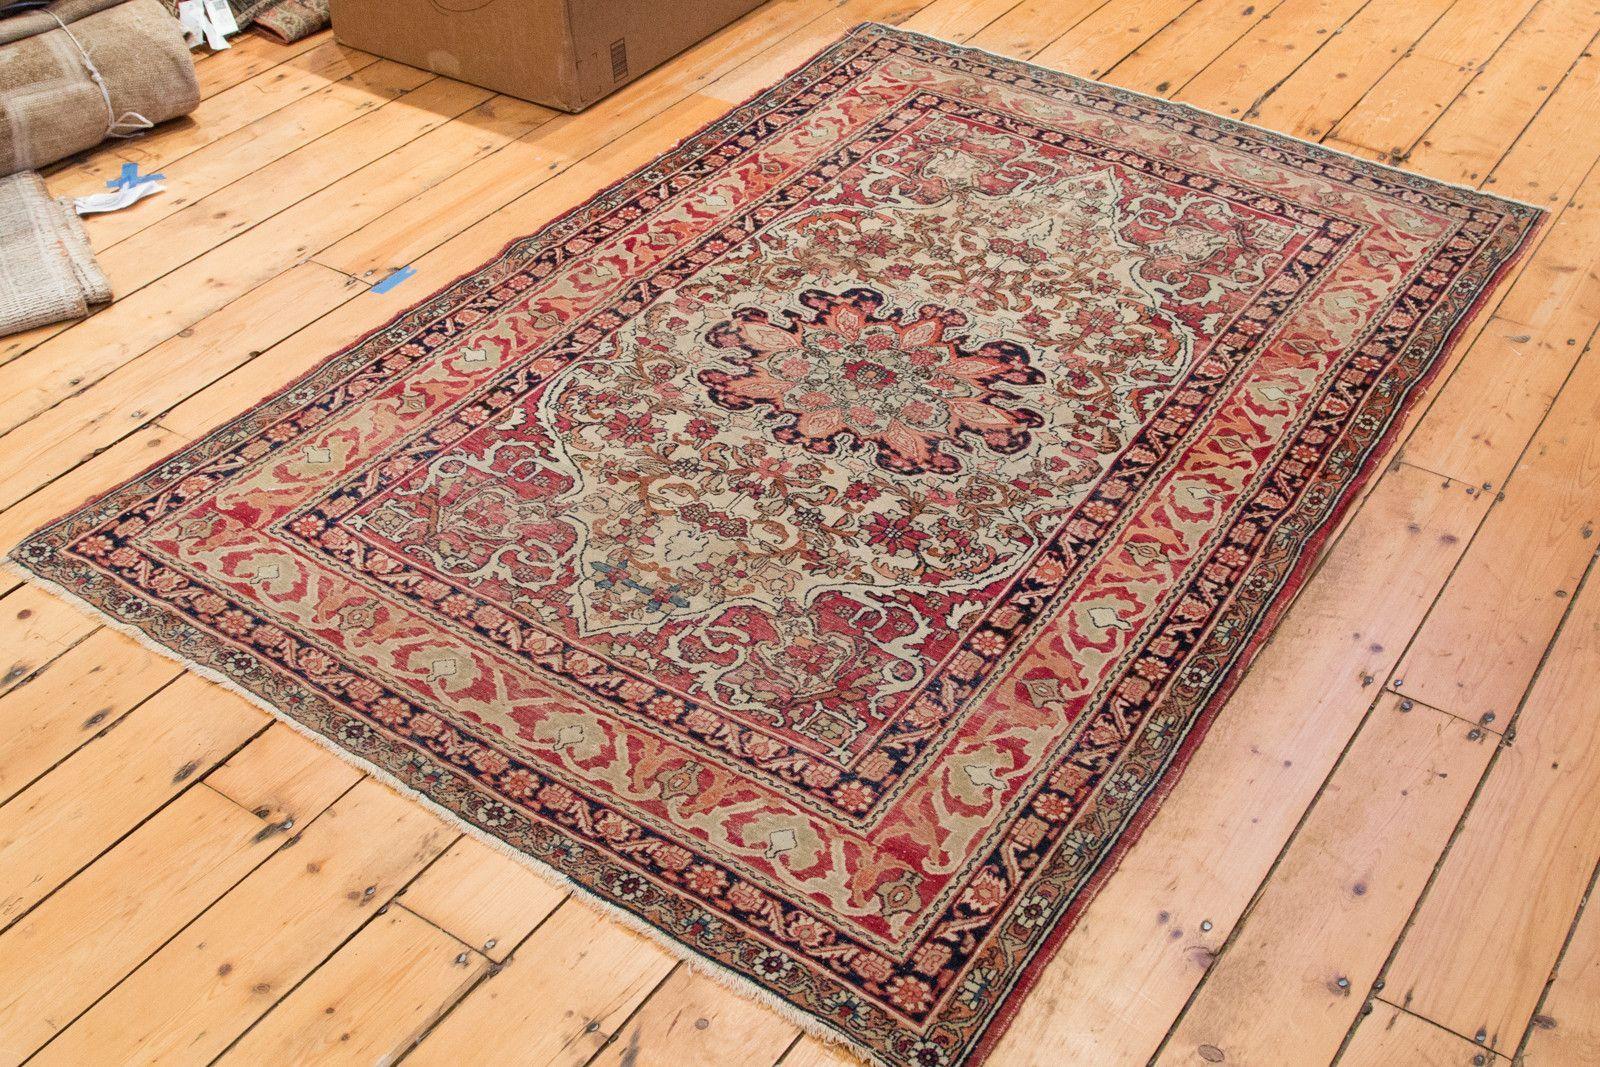 4x6 Antique Kerman Area Rug Area Rugs 4x6 Area Rugs Rugs